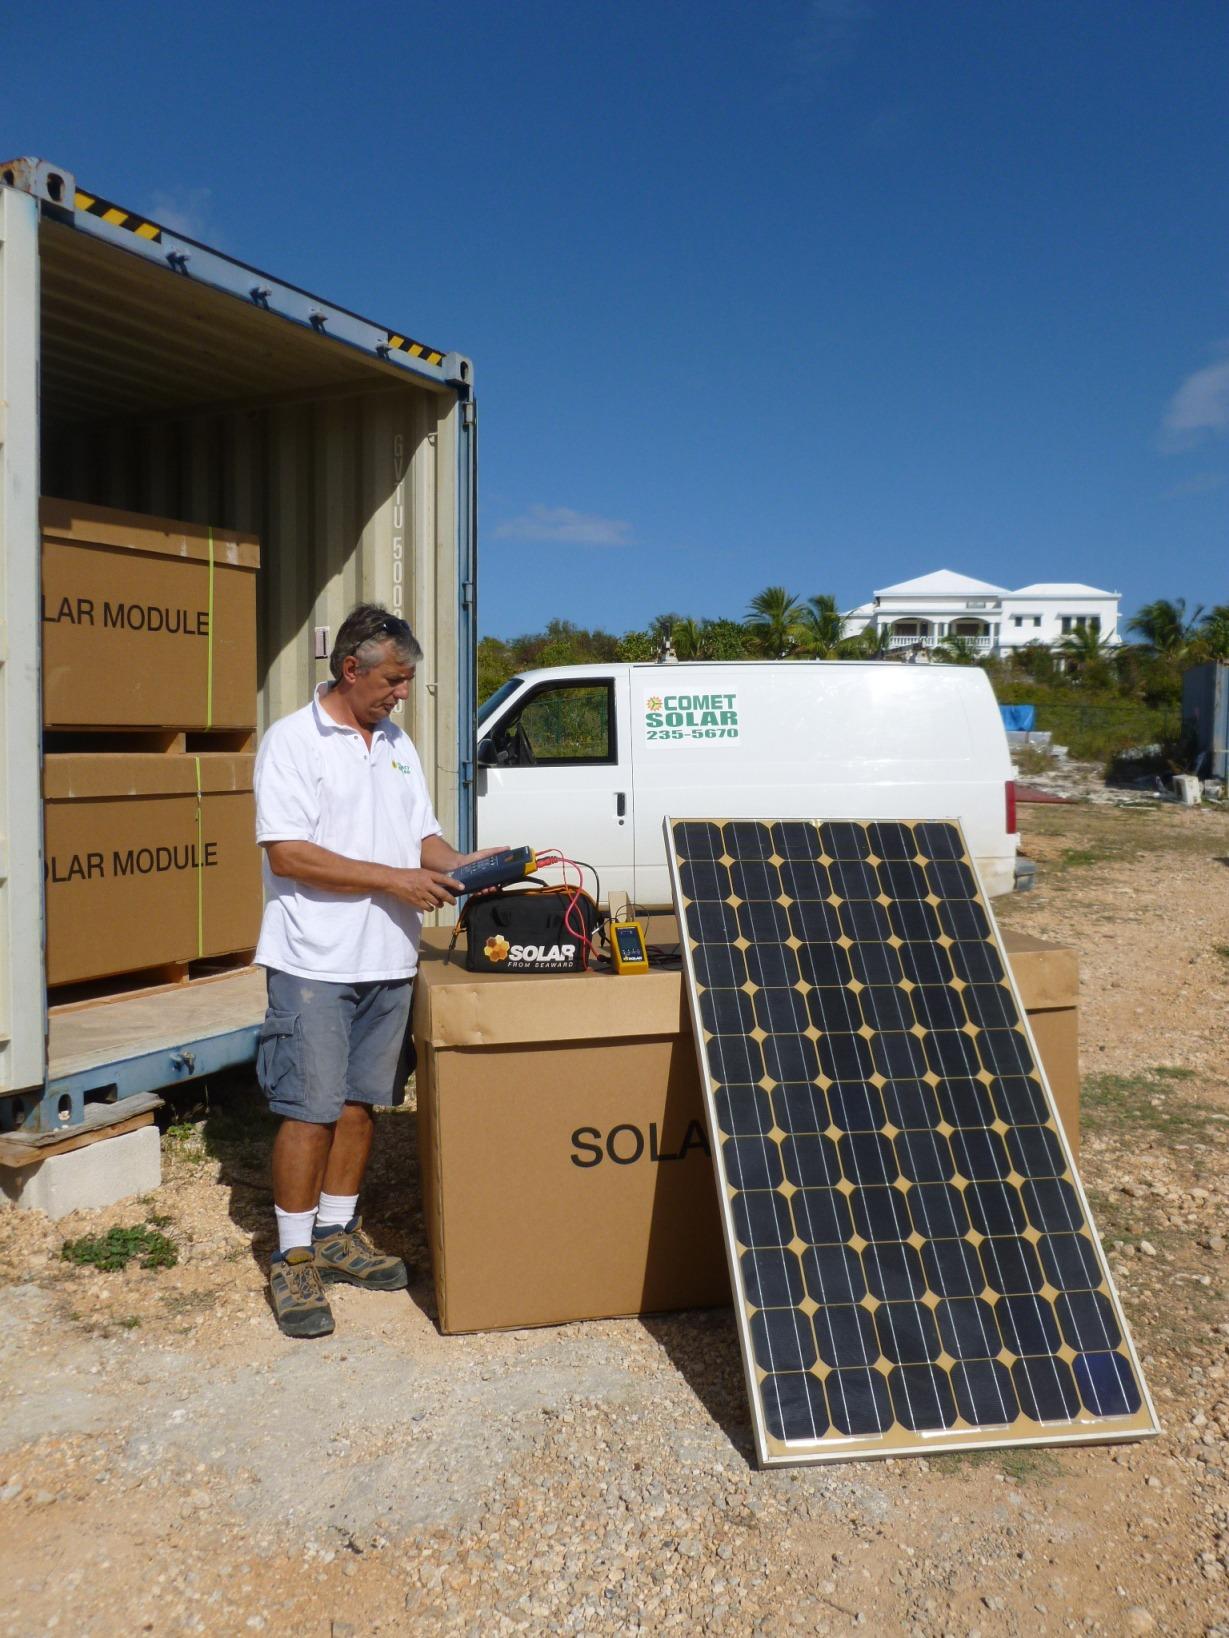 New solar PV test instrumentation helps Caribbean installer to verify system performance